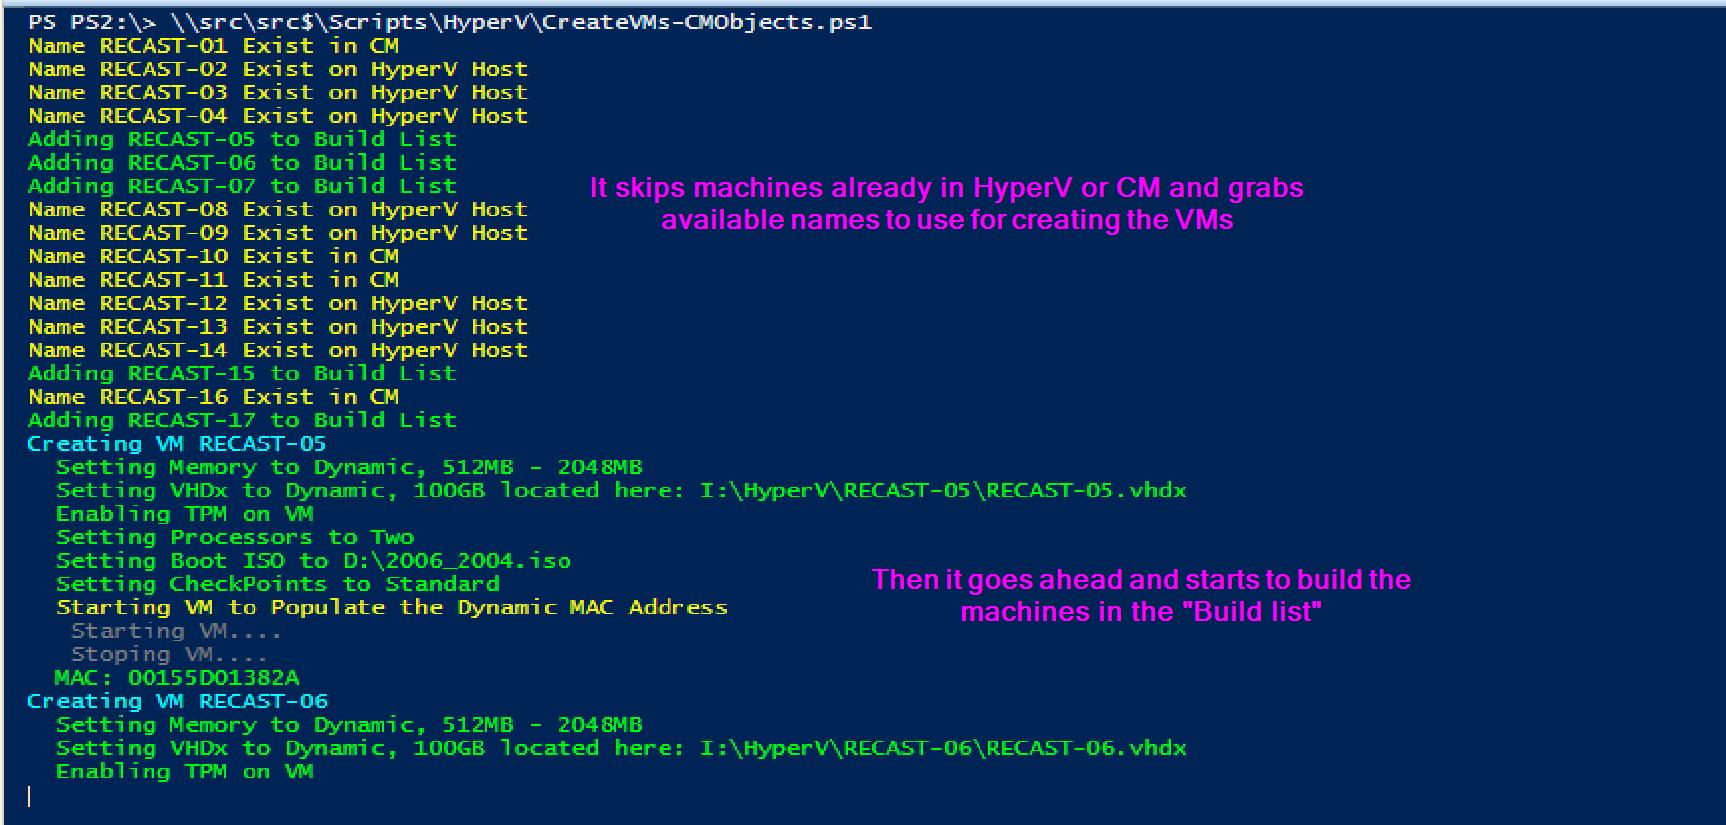 HyperV Automate 03